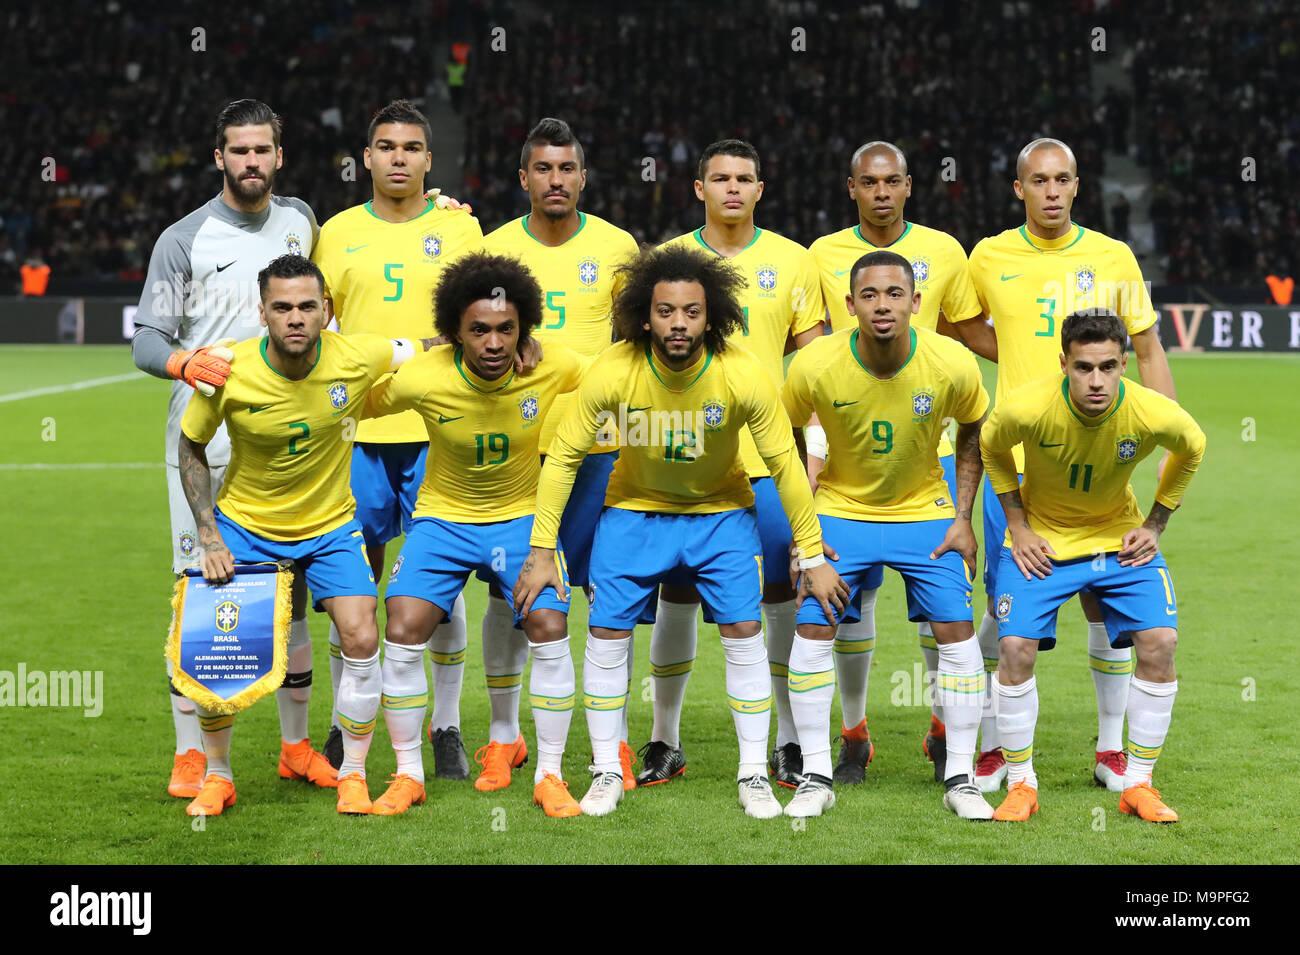 91b82cfe879 Brazil's National Soccer Team Stock Photos & Brazil's National ...